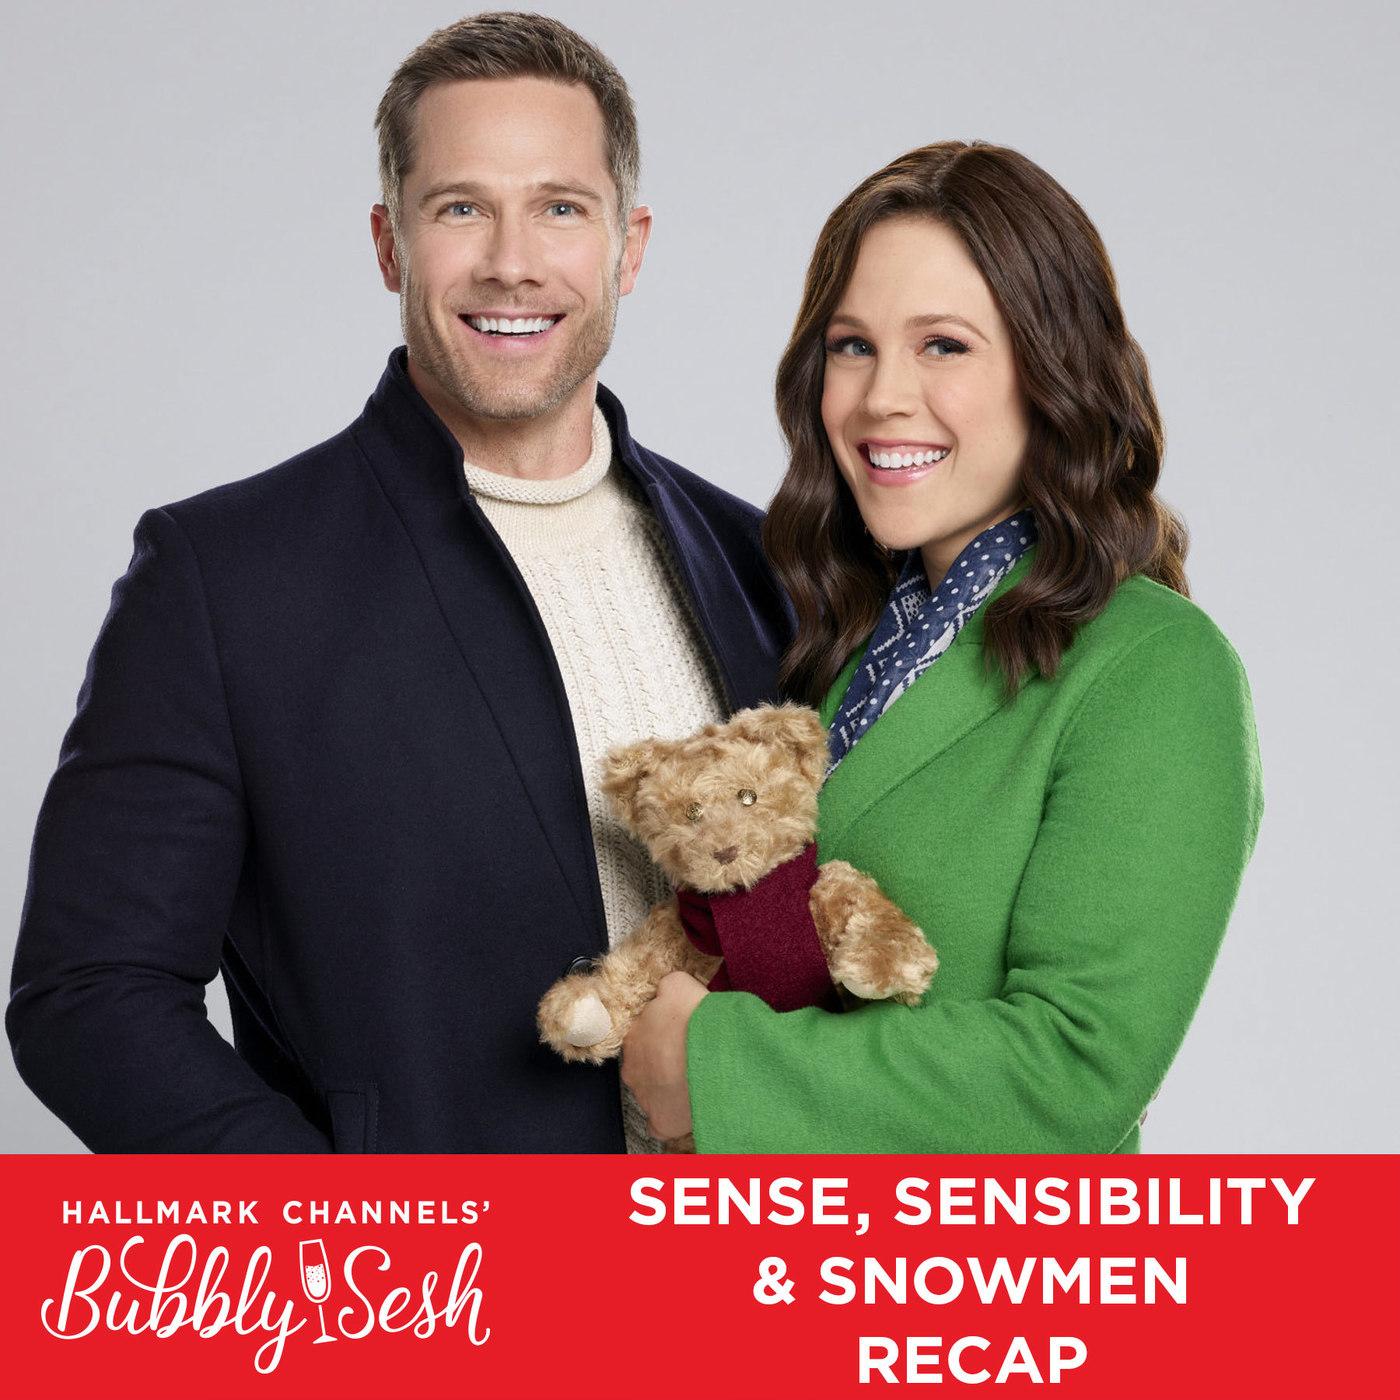 Sense, Sensibility & Snowmen Recap